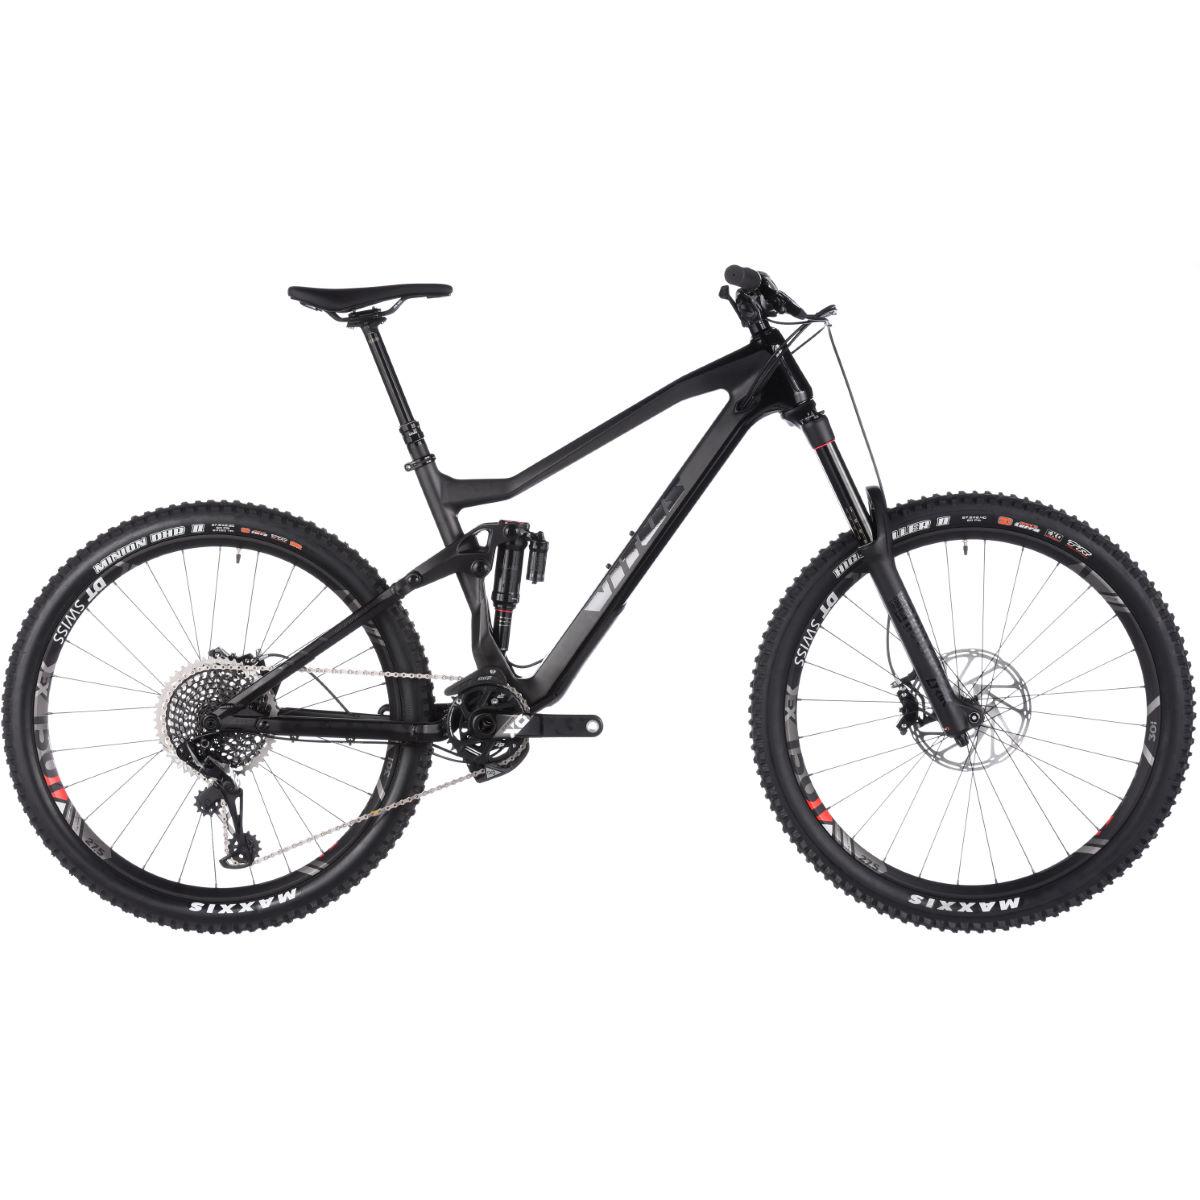 Vitus Bikes Sommet CRX Carbon XO1 Eagle 1x12 2018 FS Full